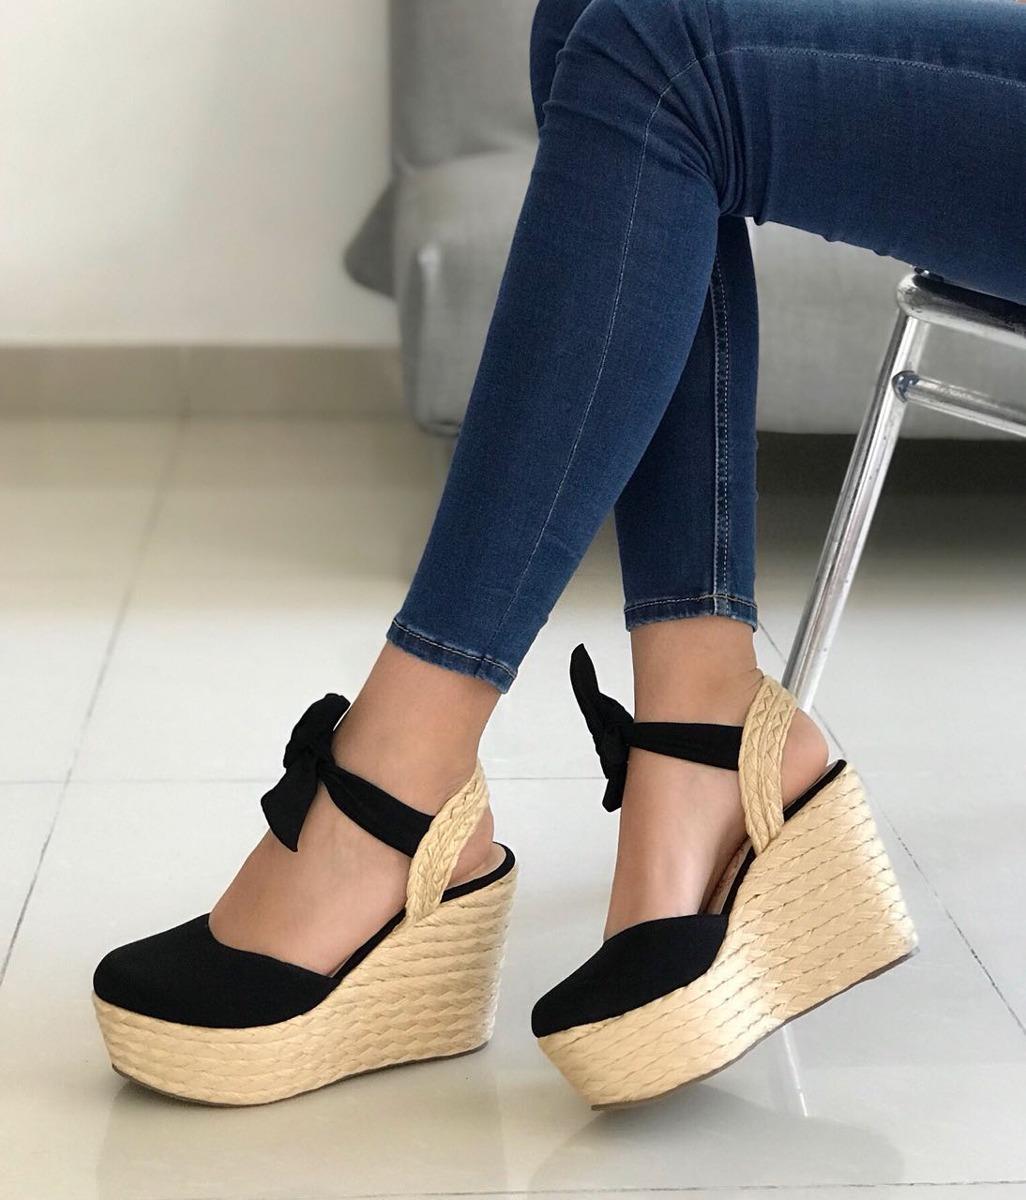 ef17ec1e0fc sandalia plataforma dama calzado cerrado moda colombiano. Cargando zoom.